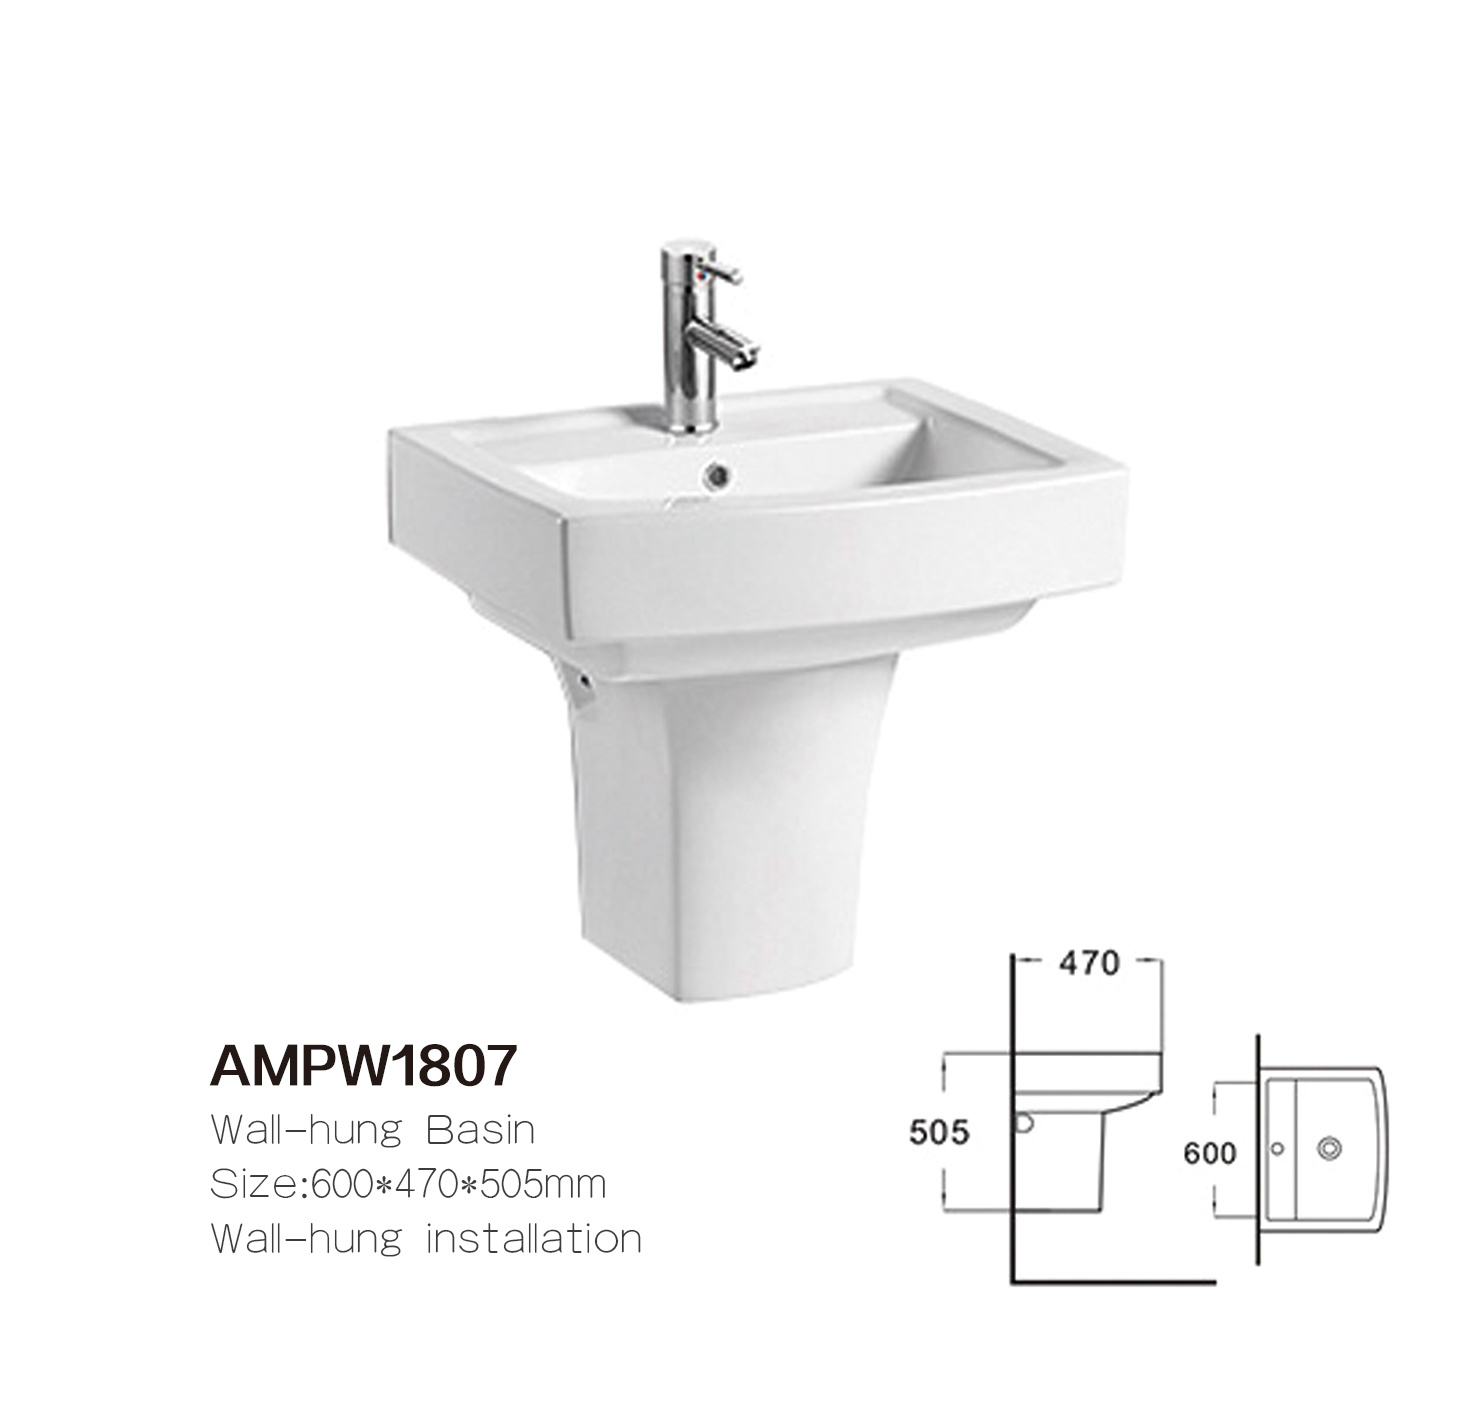 hot item ampw1807 sanitary ware square bathroom ceramic wall hung sink